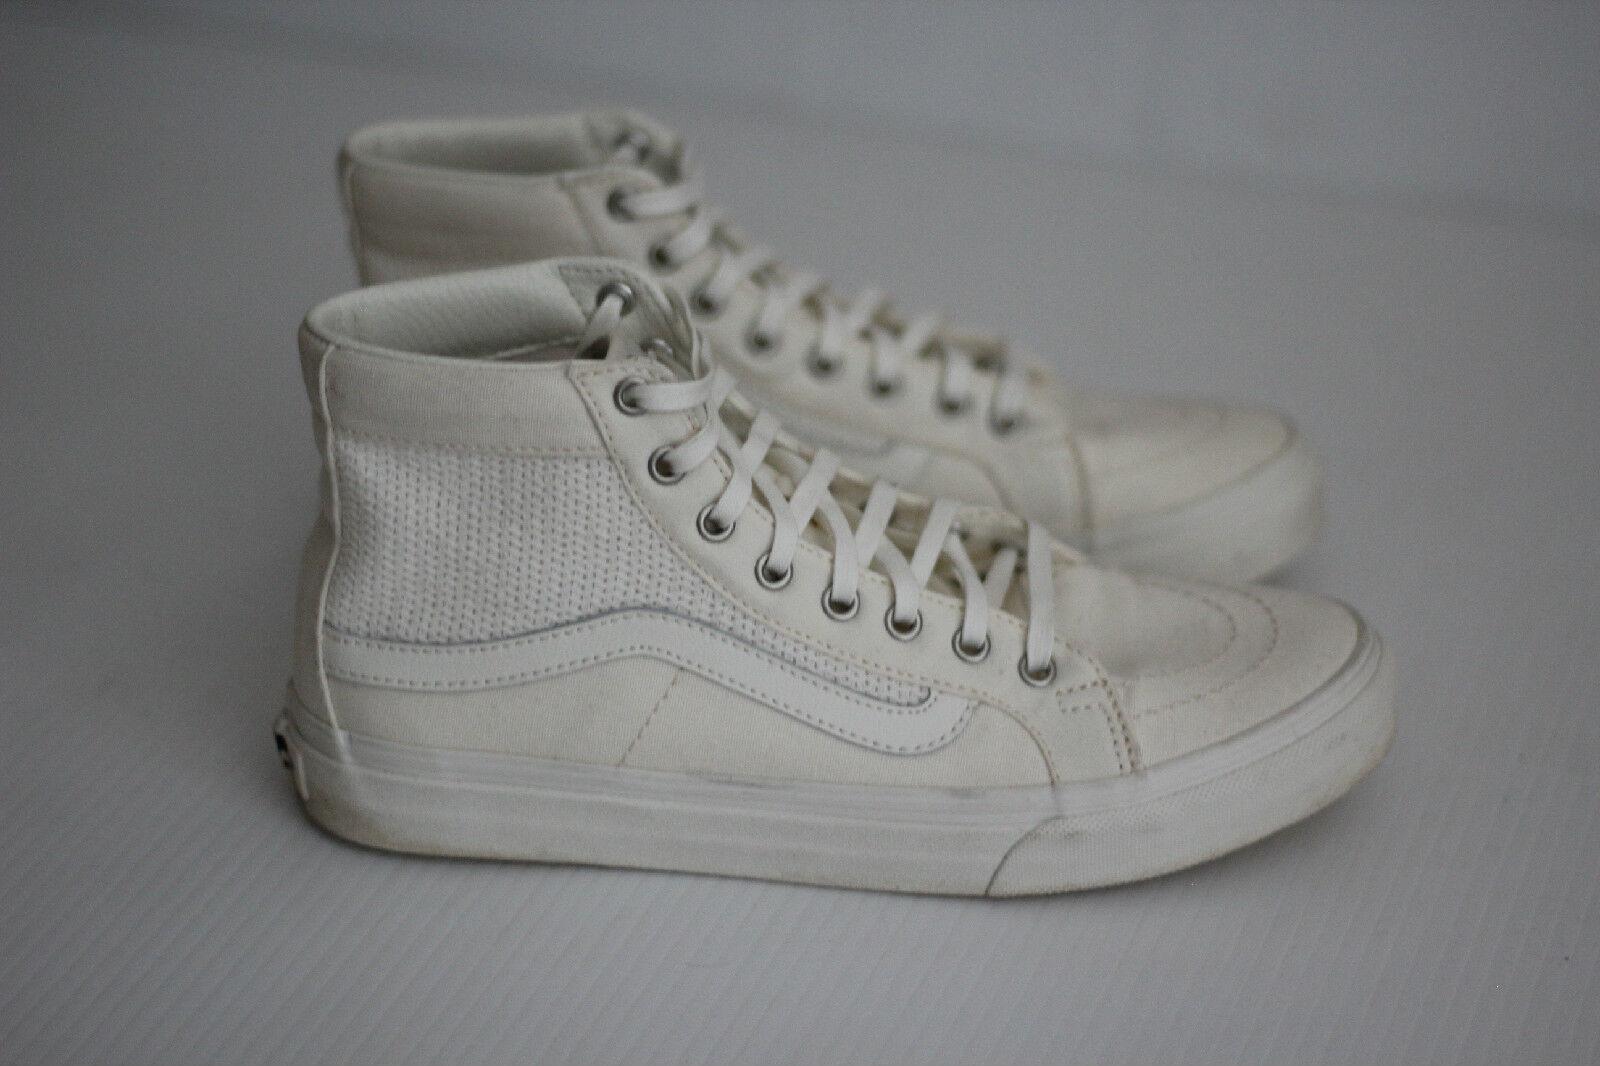 03957cdbbf7 Vans Classic Classic Classic Sk8 Hi Top Sneaker - All White True White -  Mens 6.5